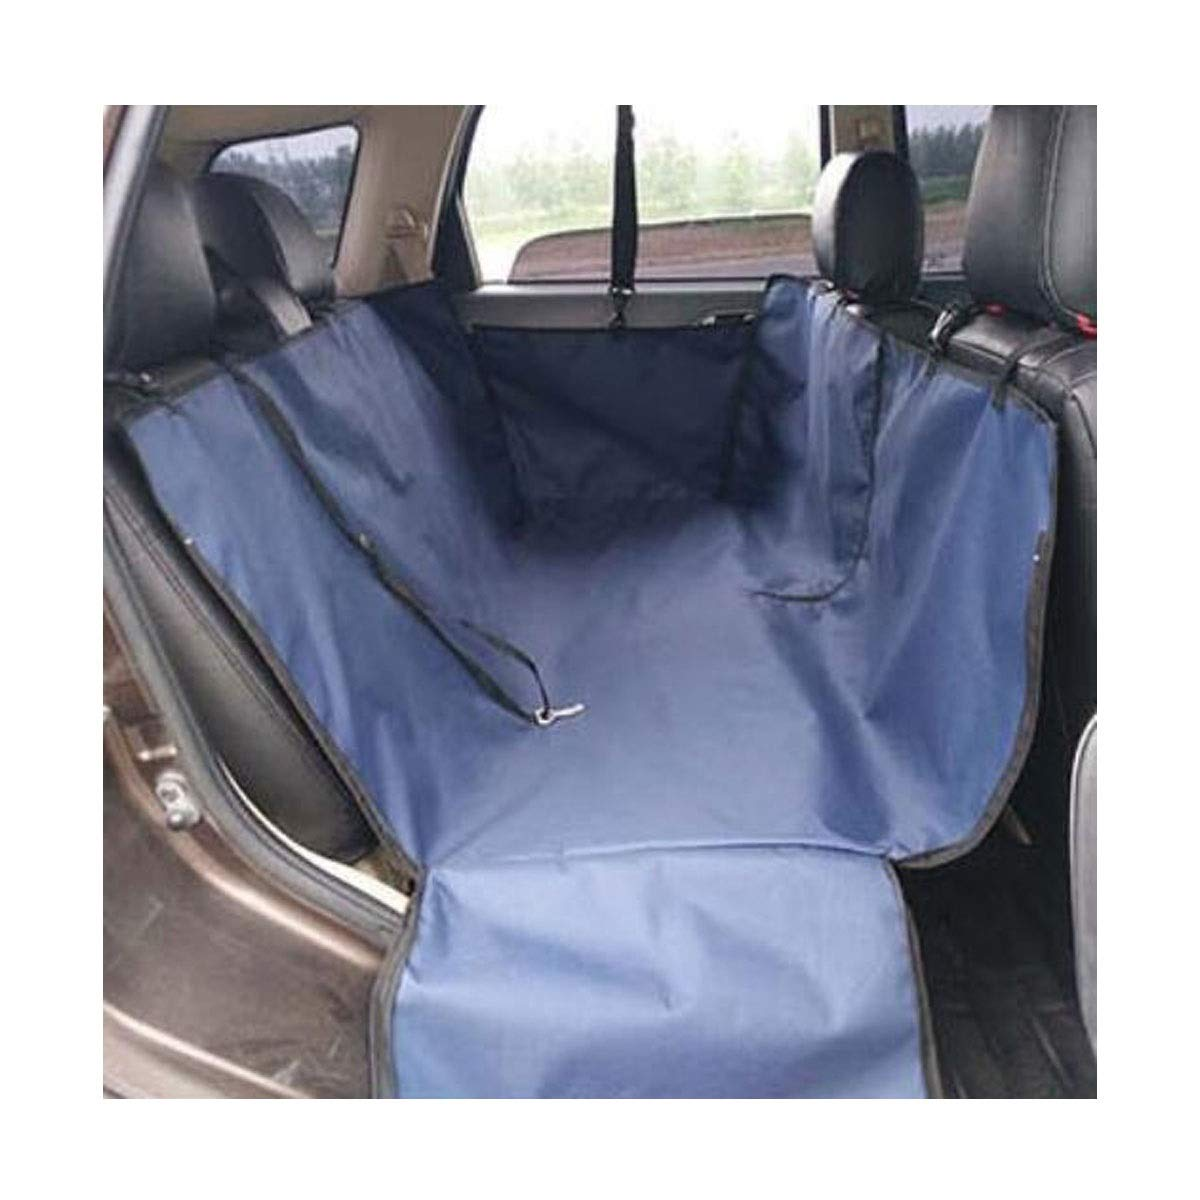 bluee 1304540 bluee 1304540 Jiansheng Dog Car Seat Cover, Dog Artifact Car Rear Seat Anti-dirty Safety Seat Hammock Heavy Duty Non-slip Waterproof, Brown 130  45  40cm (color   Dark bluee, Size   130  45  40)